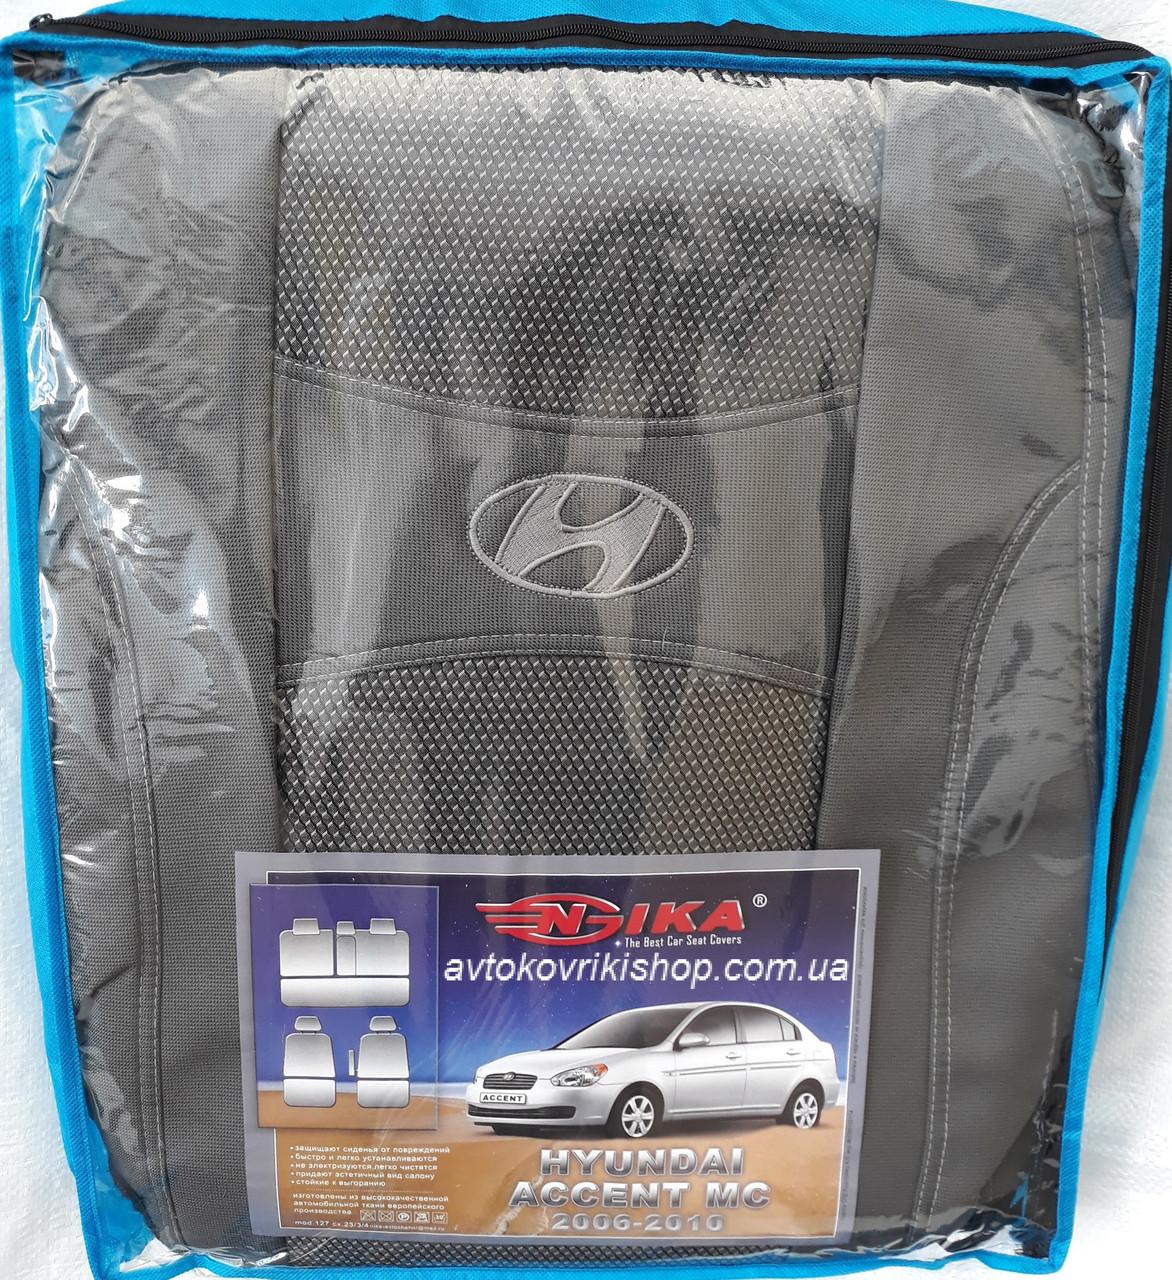 Авточехлы Hyundai Accent MC 2006-2010 Nika